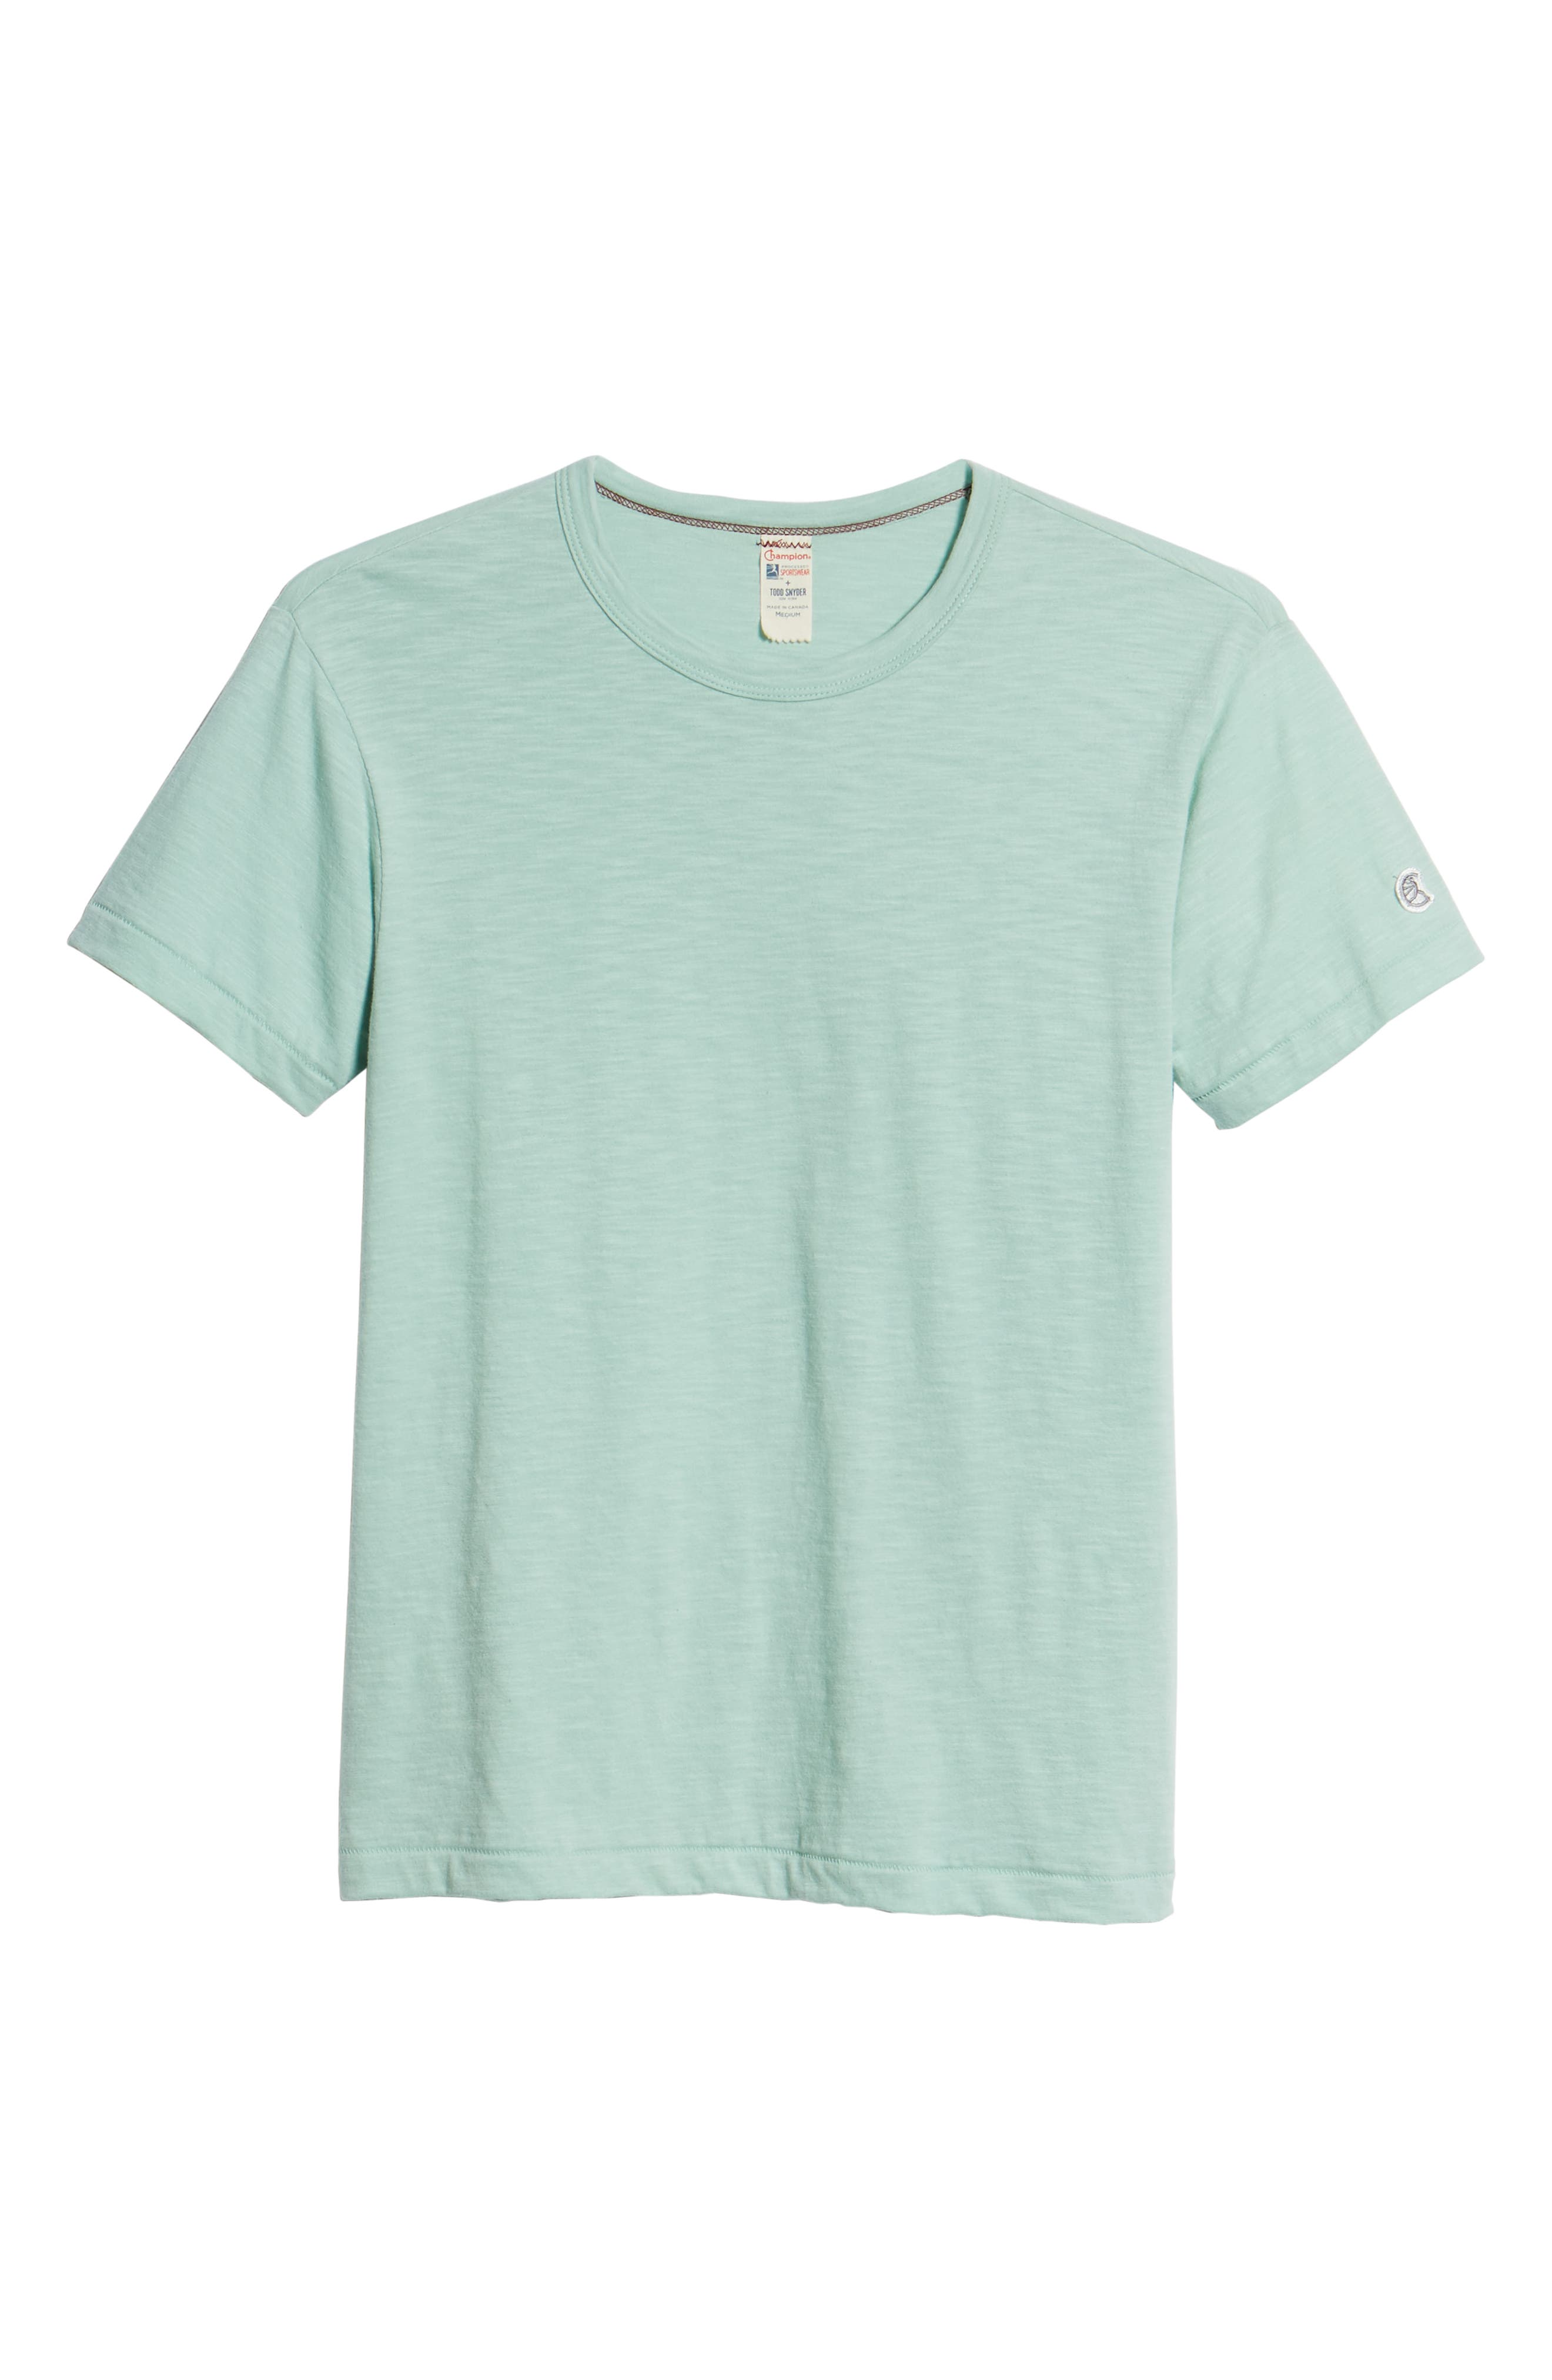 + Champion Crewneck T-Shirt,                             Alternate thumbnail 6, color,                             Vintage Aqua